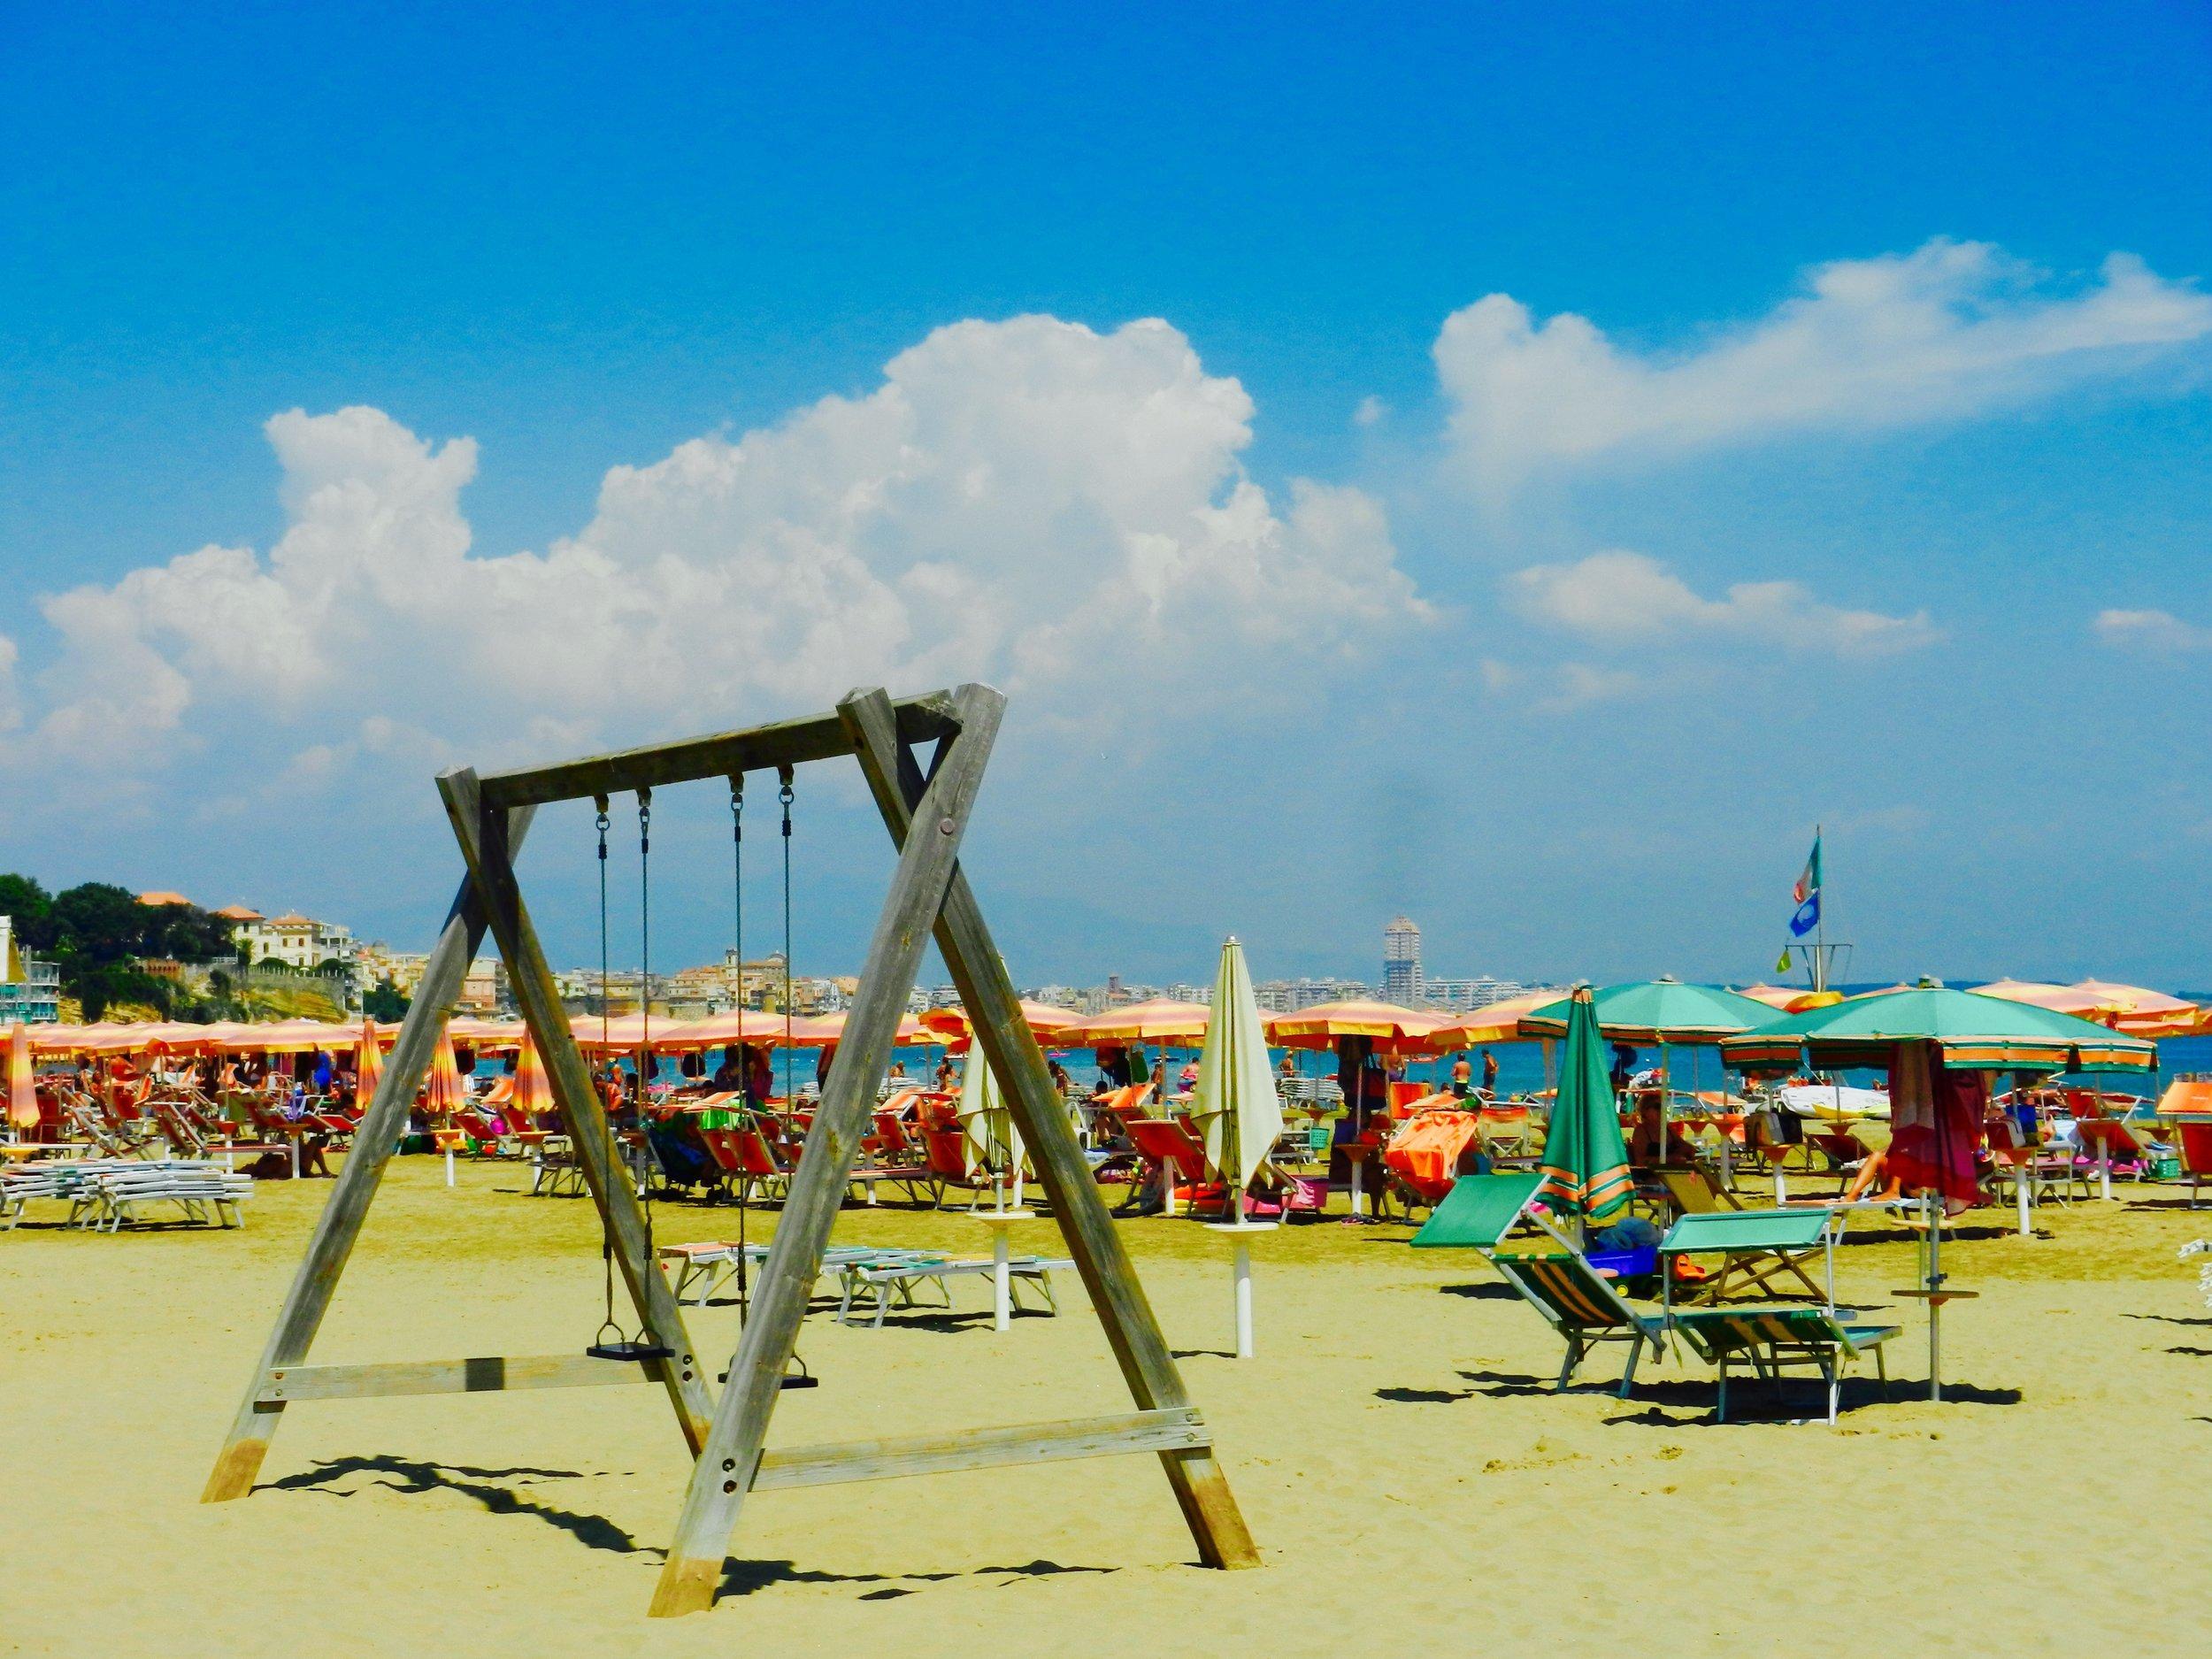 Anzio Beach. Photo by Britnae Purdy